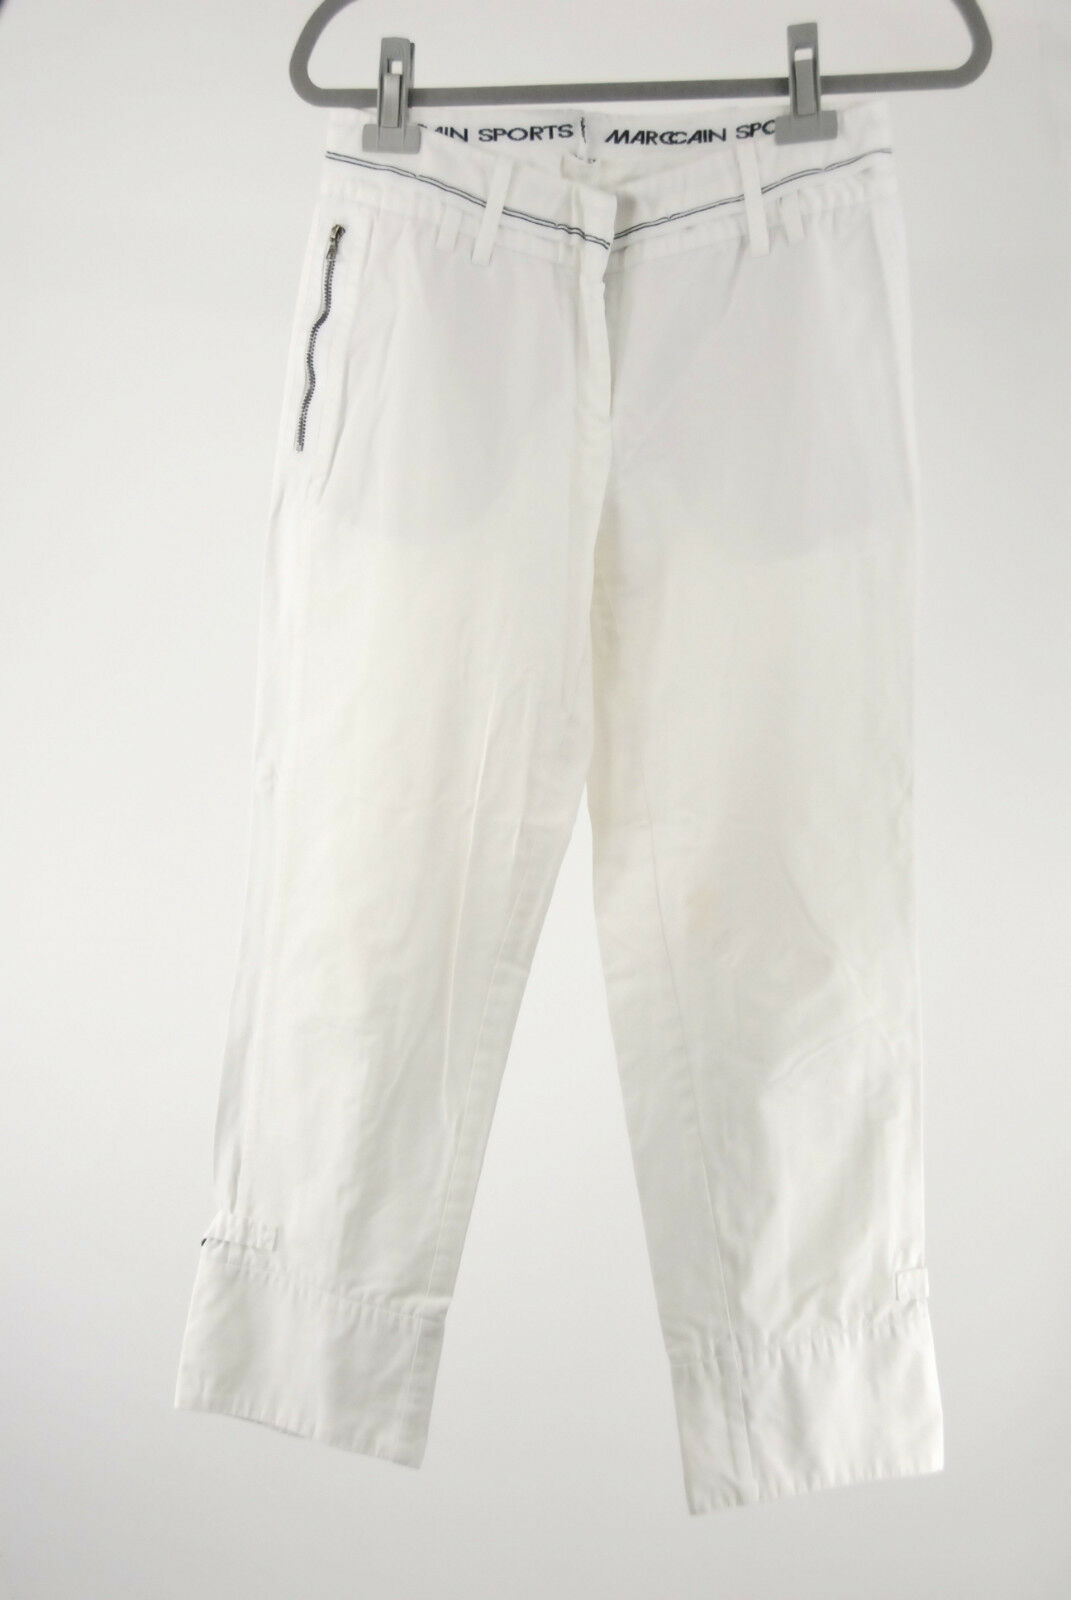 Marc Cain Hose N 4 40 (D) Baumwolle white top Marccain